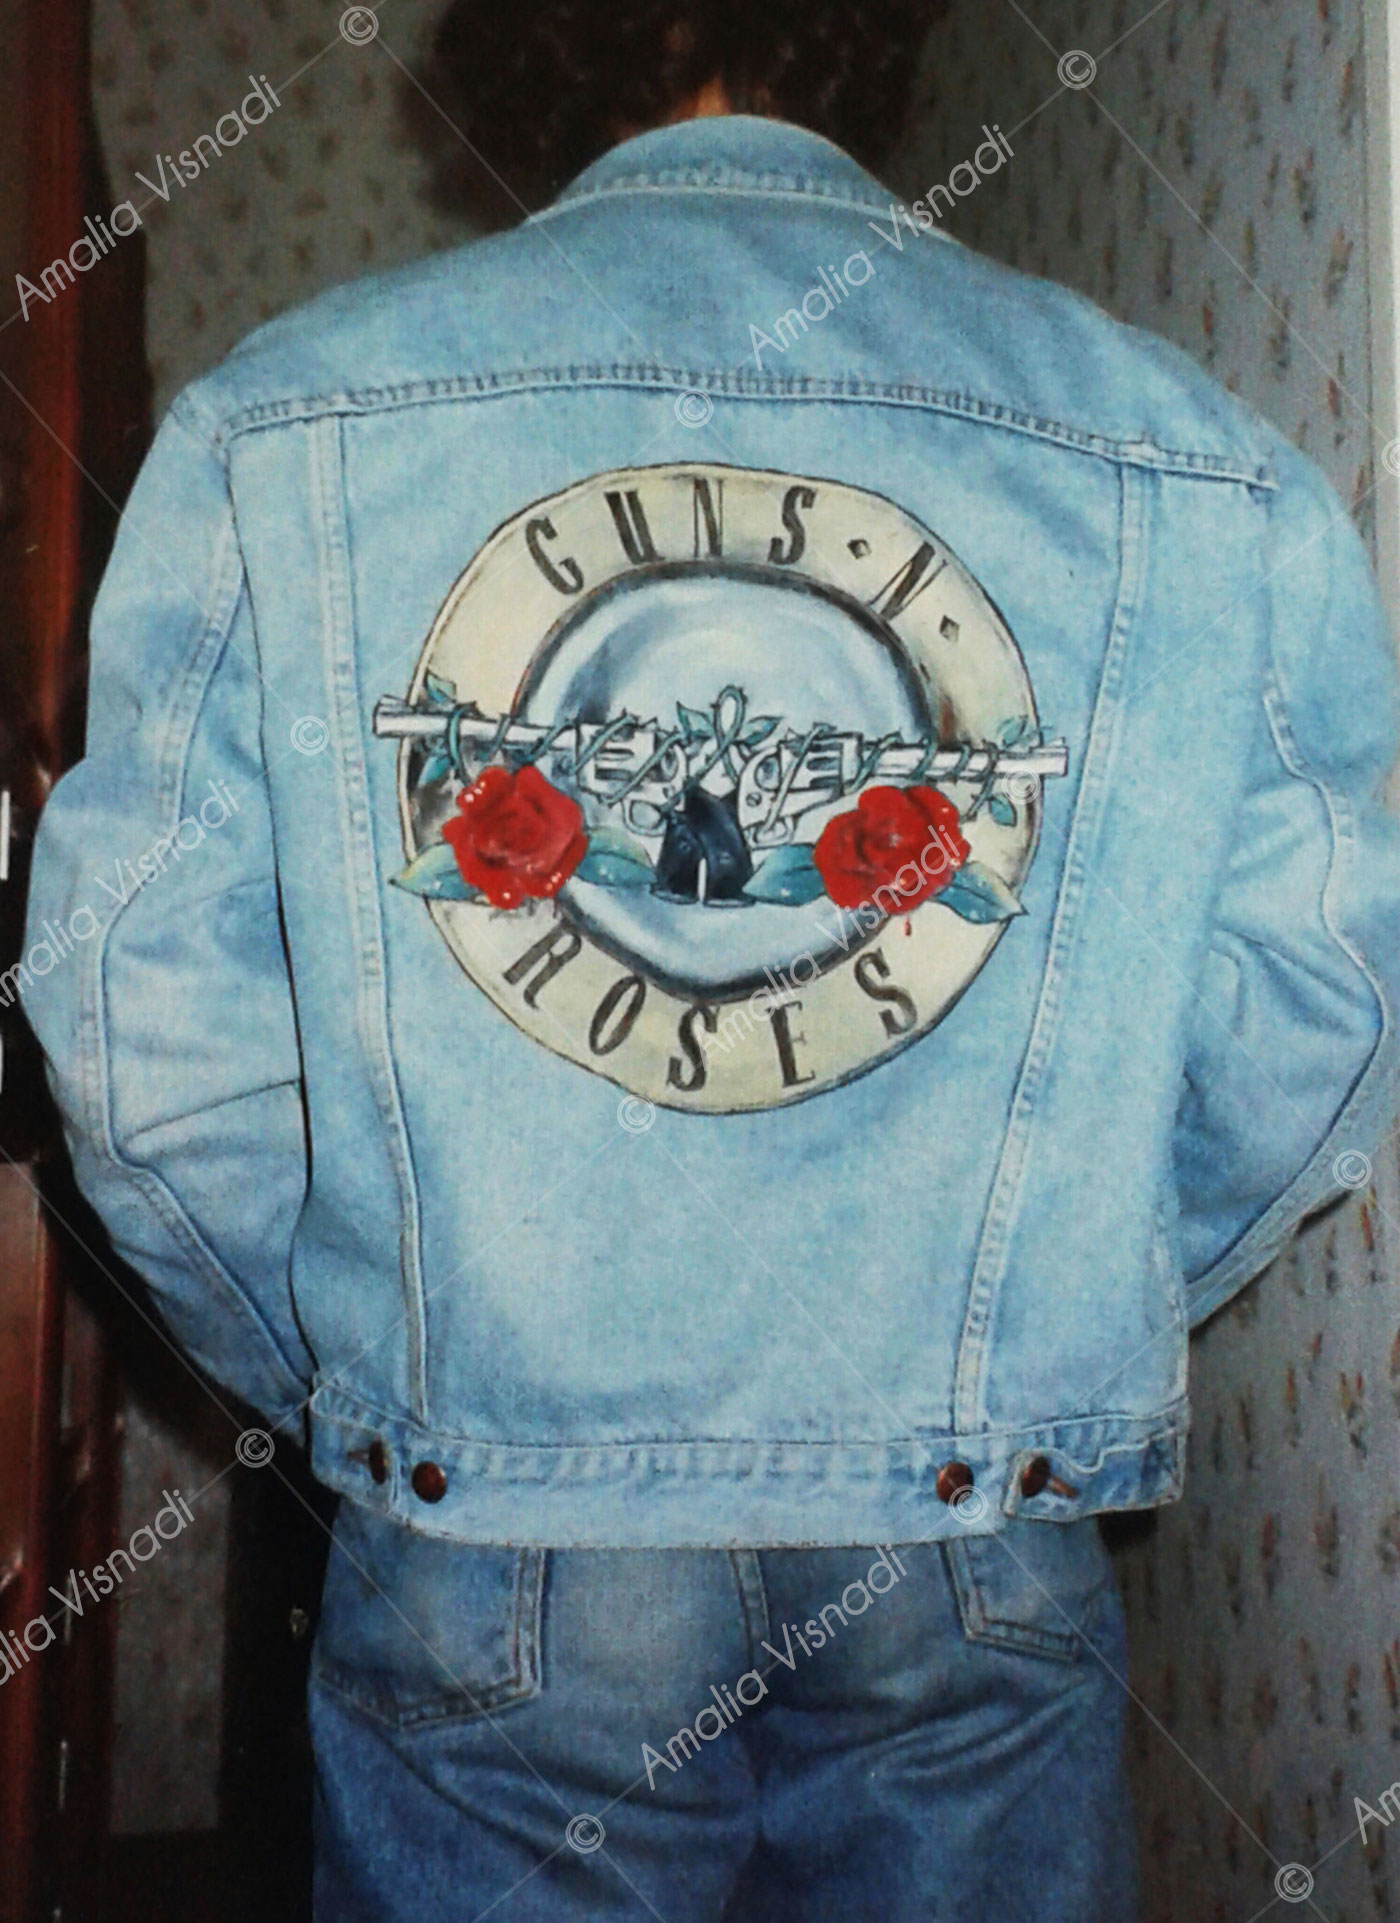 Amalia Visnadi_Giubbotto jeans logo Guns 'n Roses